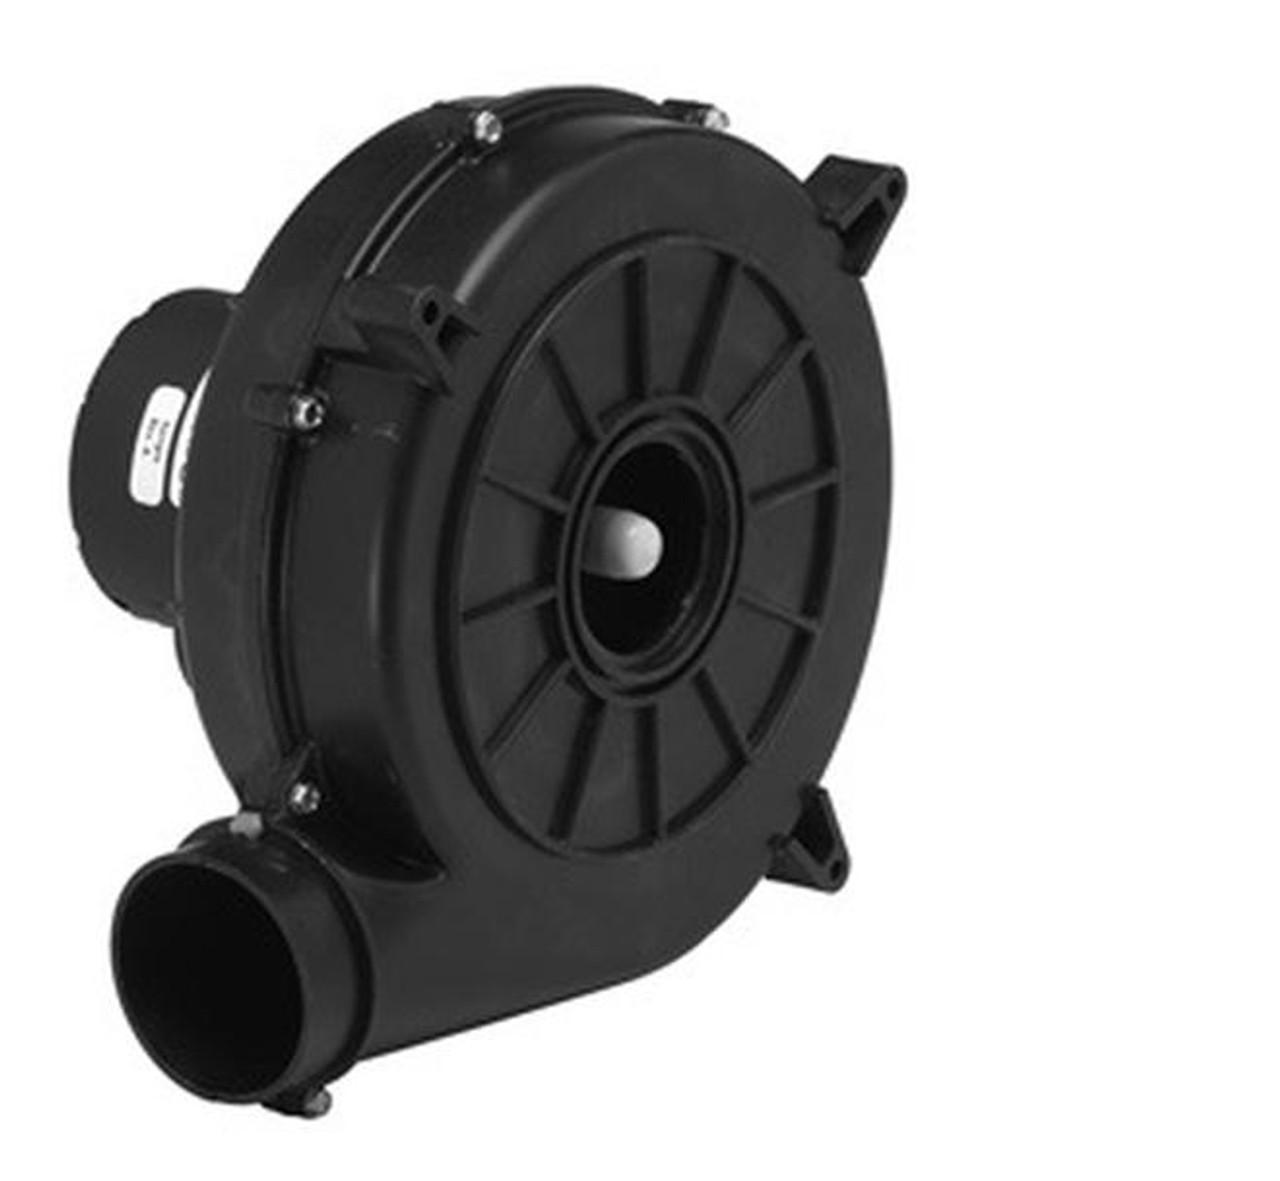 (opened box) Nordyne Furnace Draft Inducer blower 115V (7021-11227, 6219490) Fasco # A122